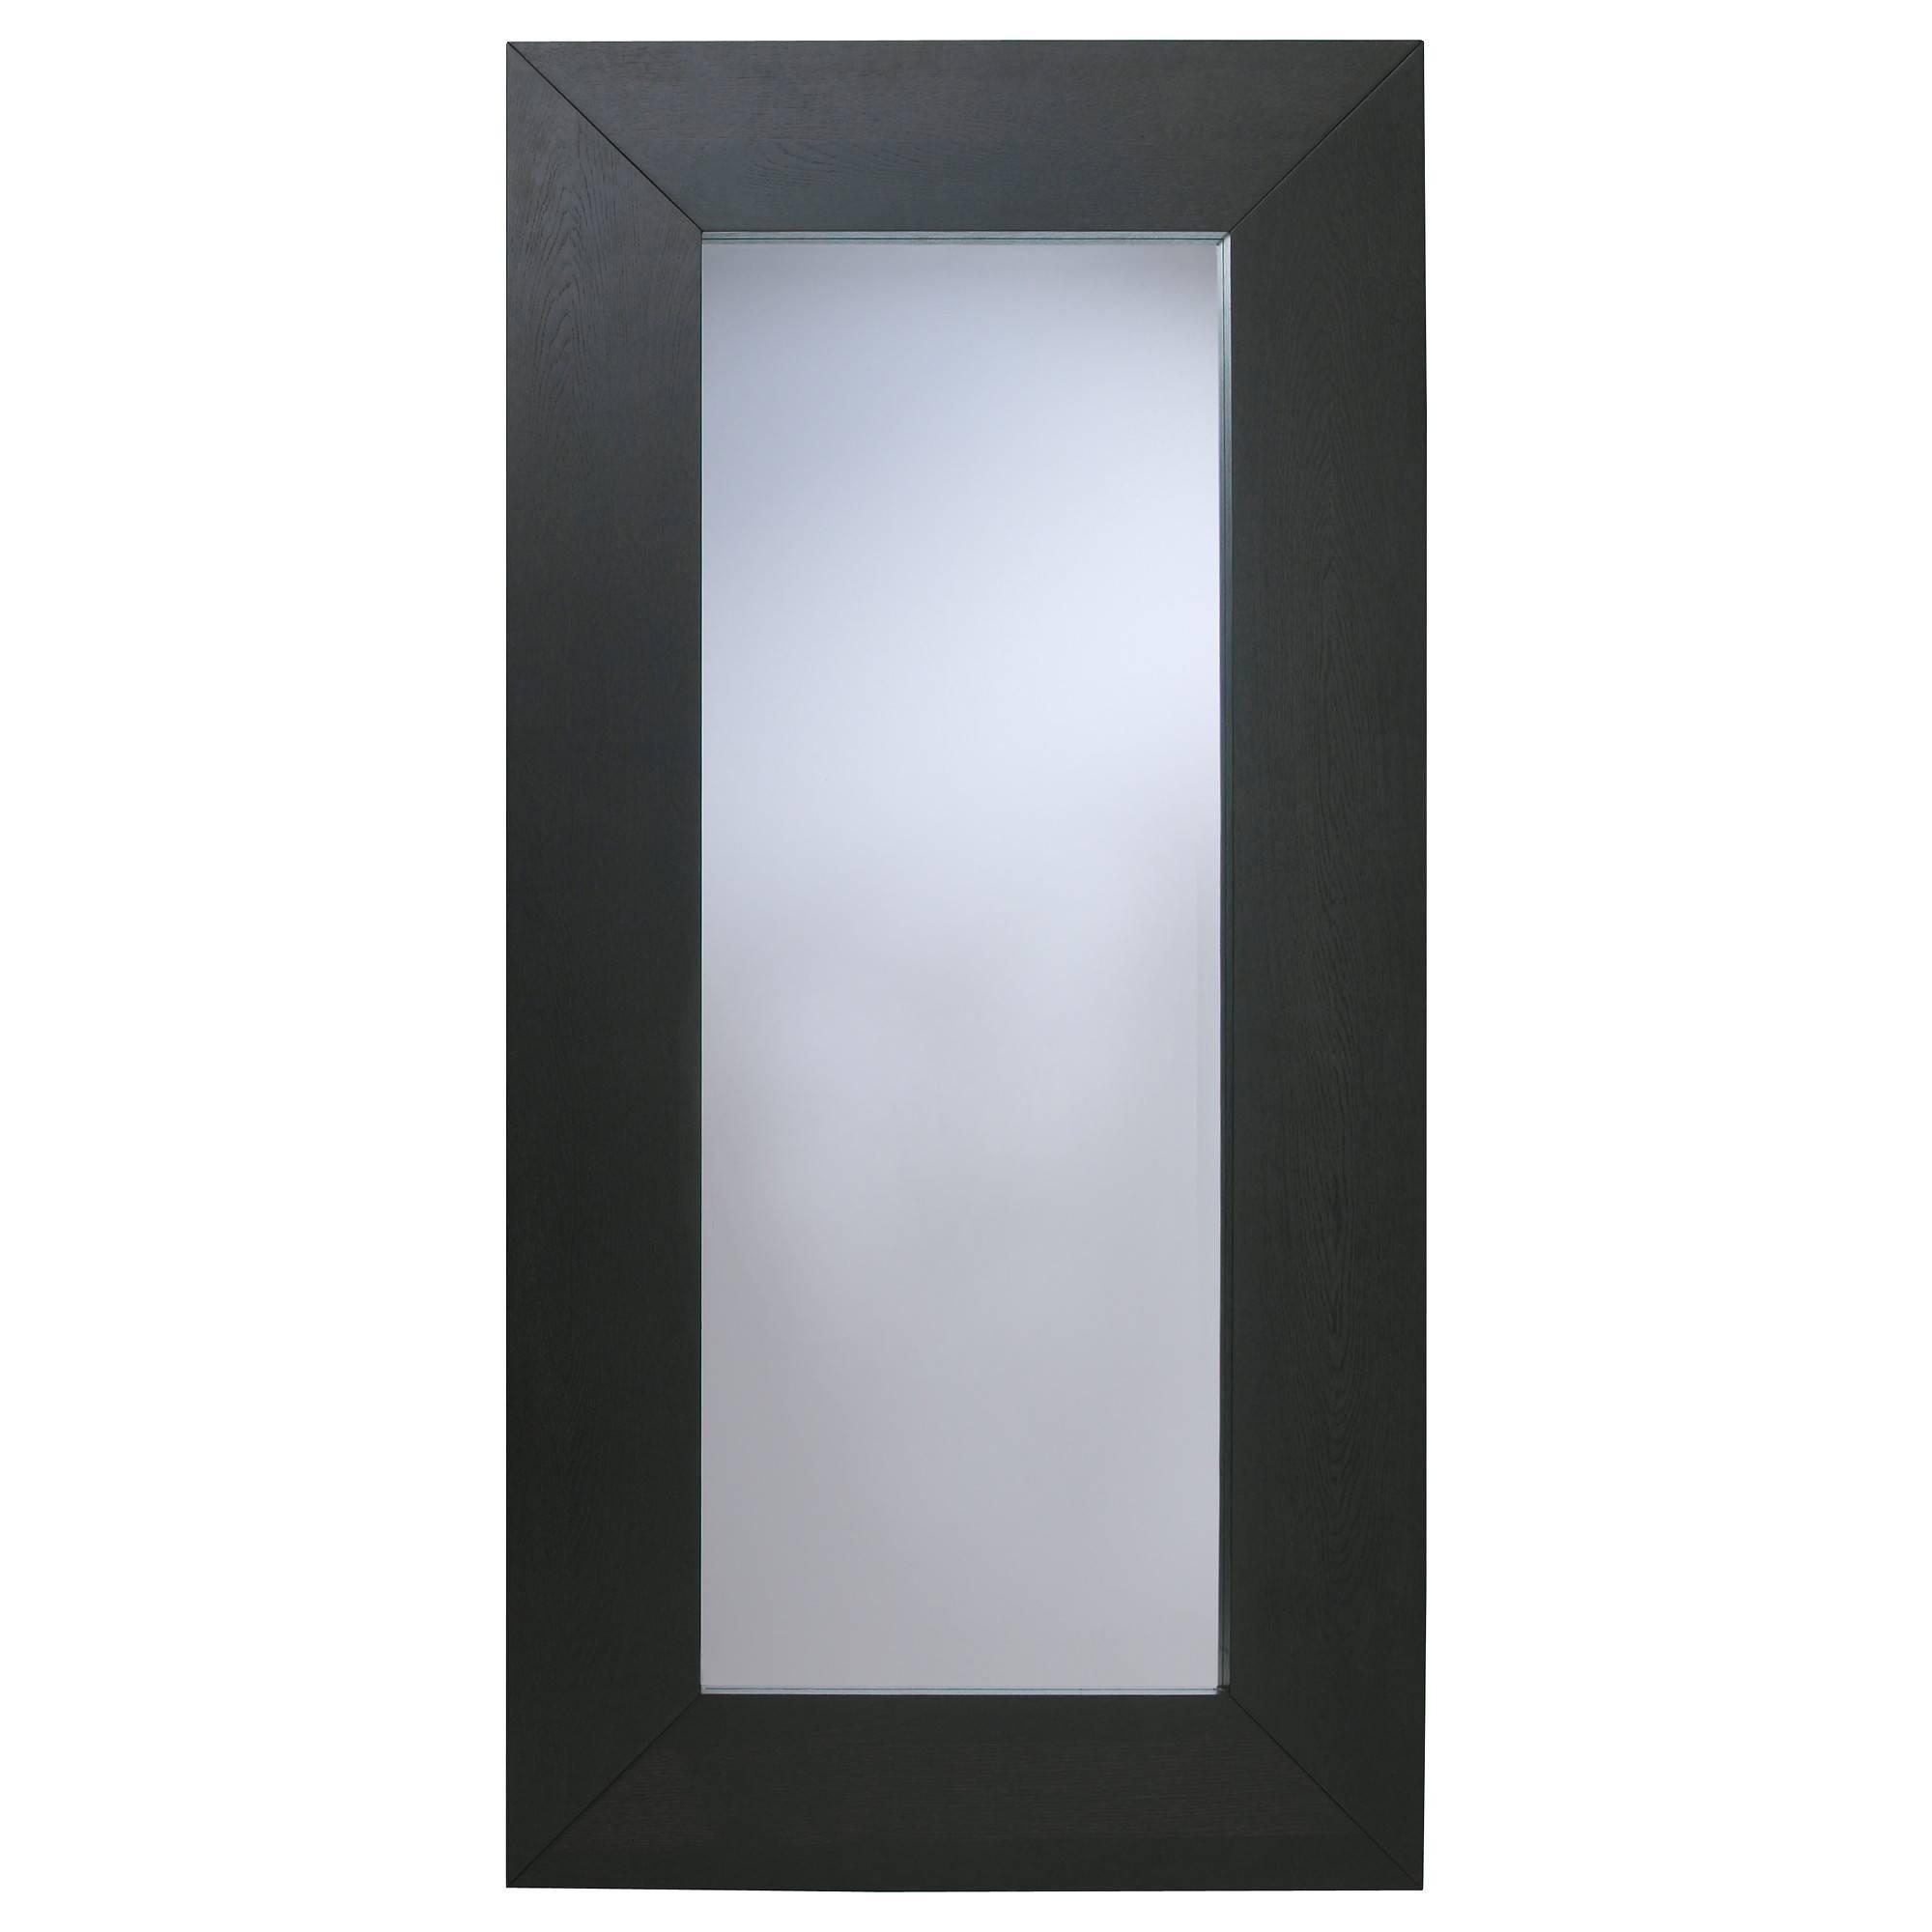 Wall Mirrors - Ikea regarding Ornate Full Length Wall Mirrors (Image 25 of 25)